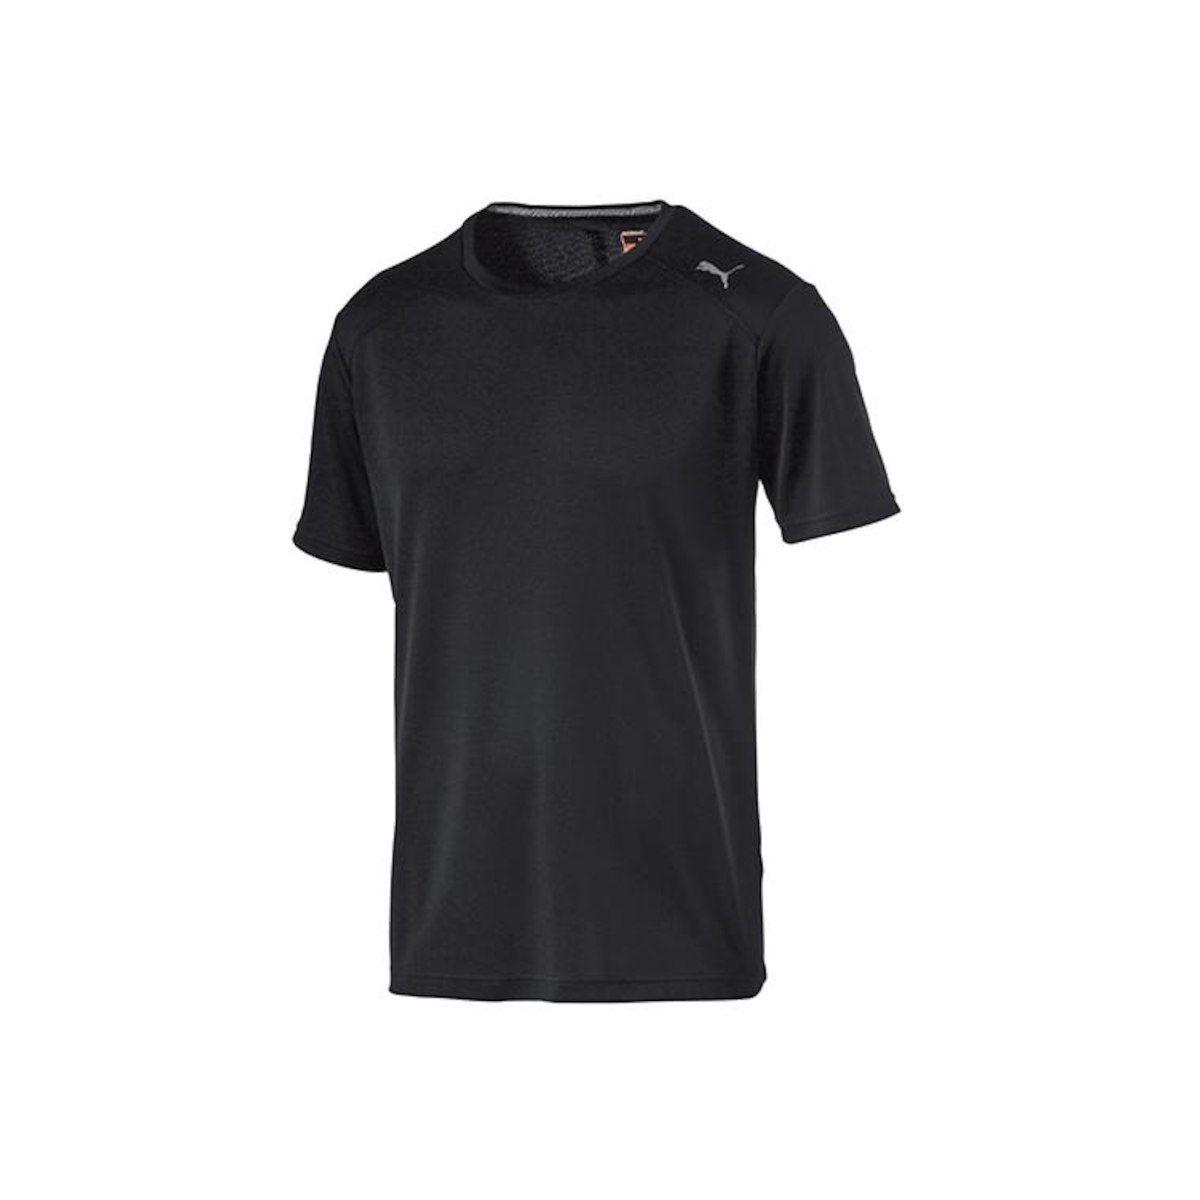 Camiseta Puma Essential Tee Cód 513605 01